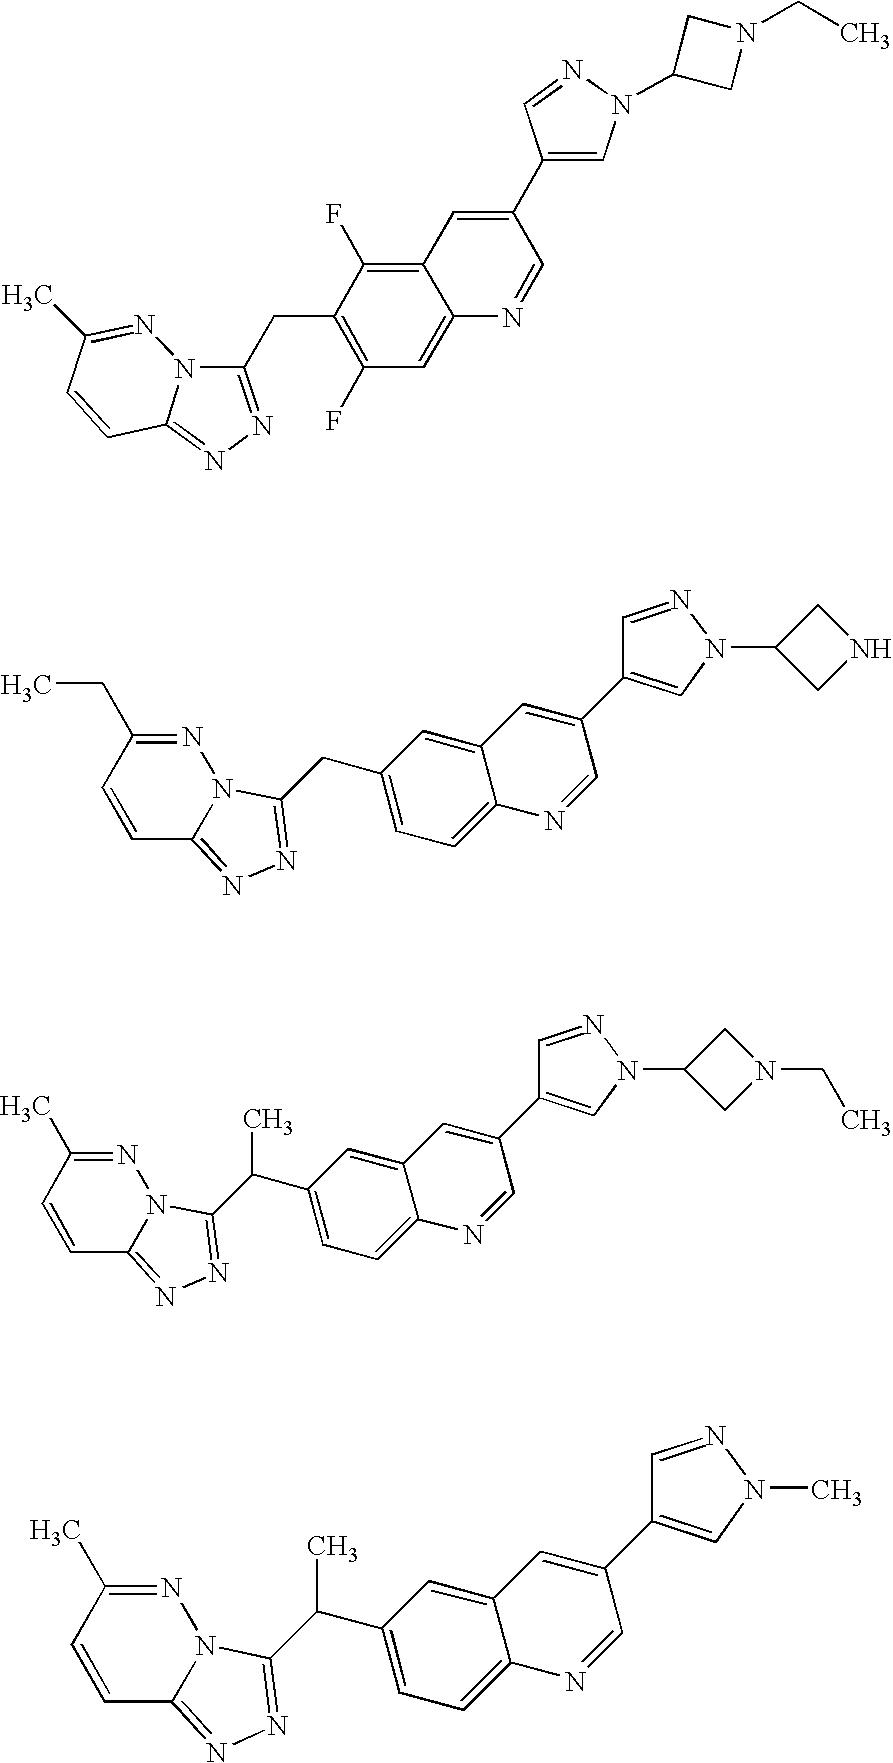 us8071581b2 triazolopyridazine protein kinase modulators Residential Electrical Meter Wiring Diagram figure us08071581 20111206 c00051